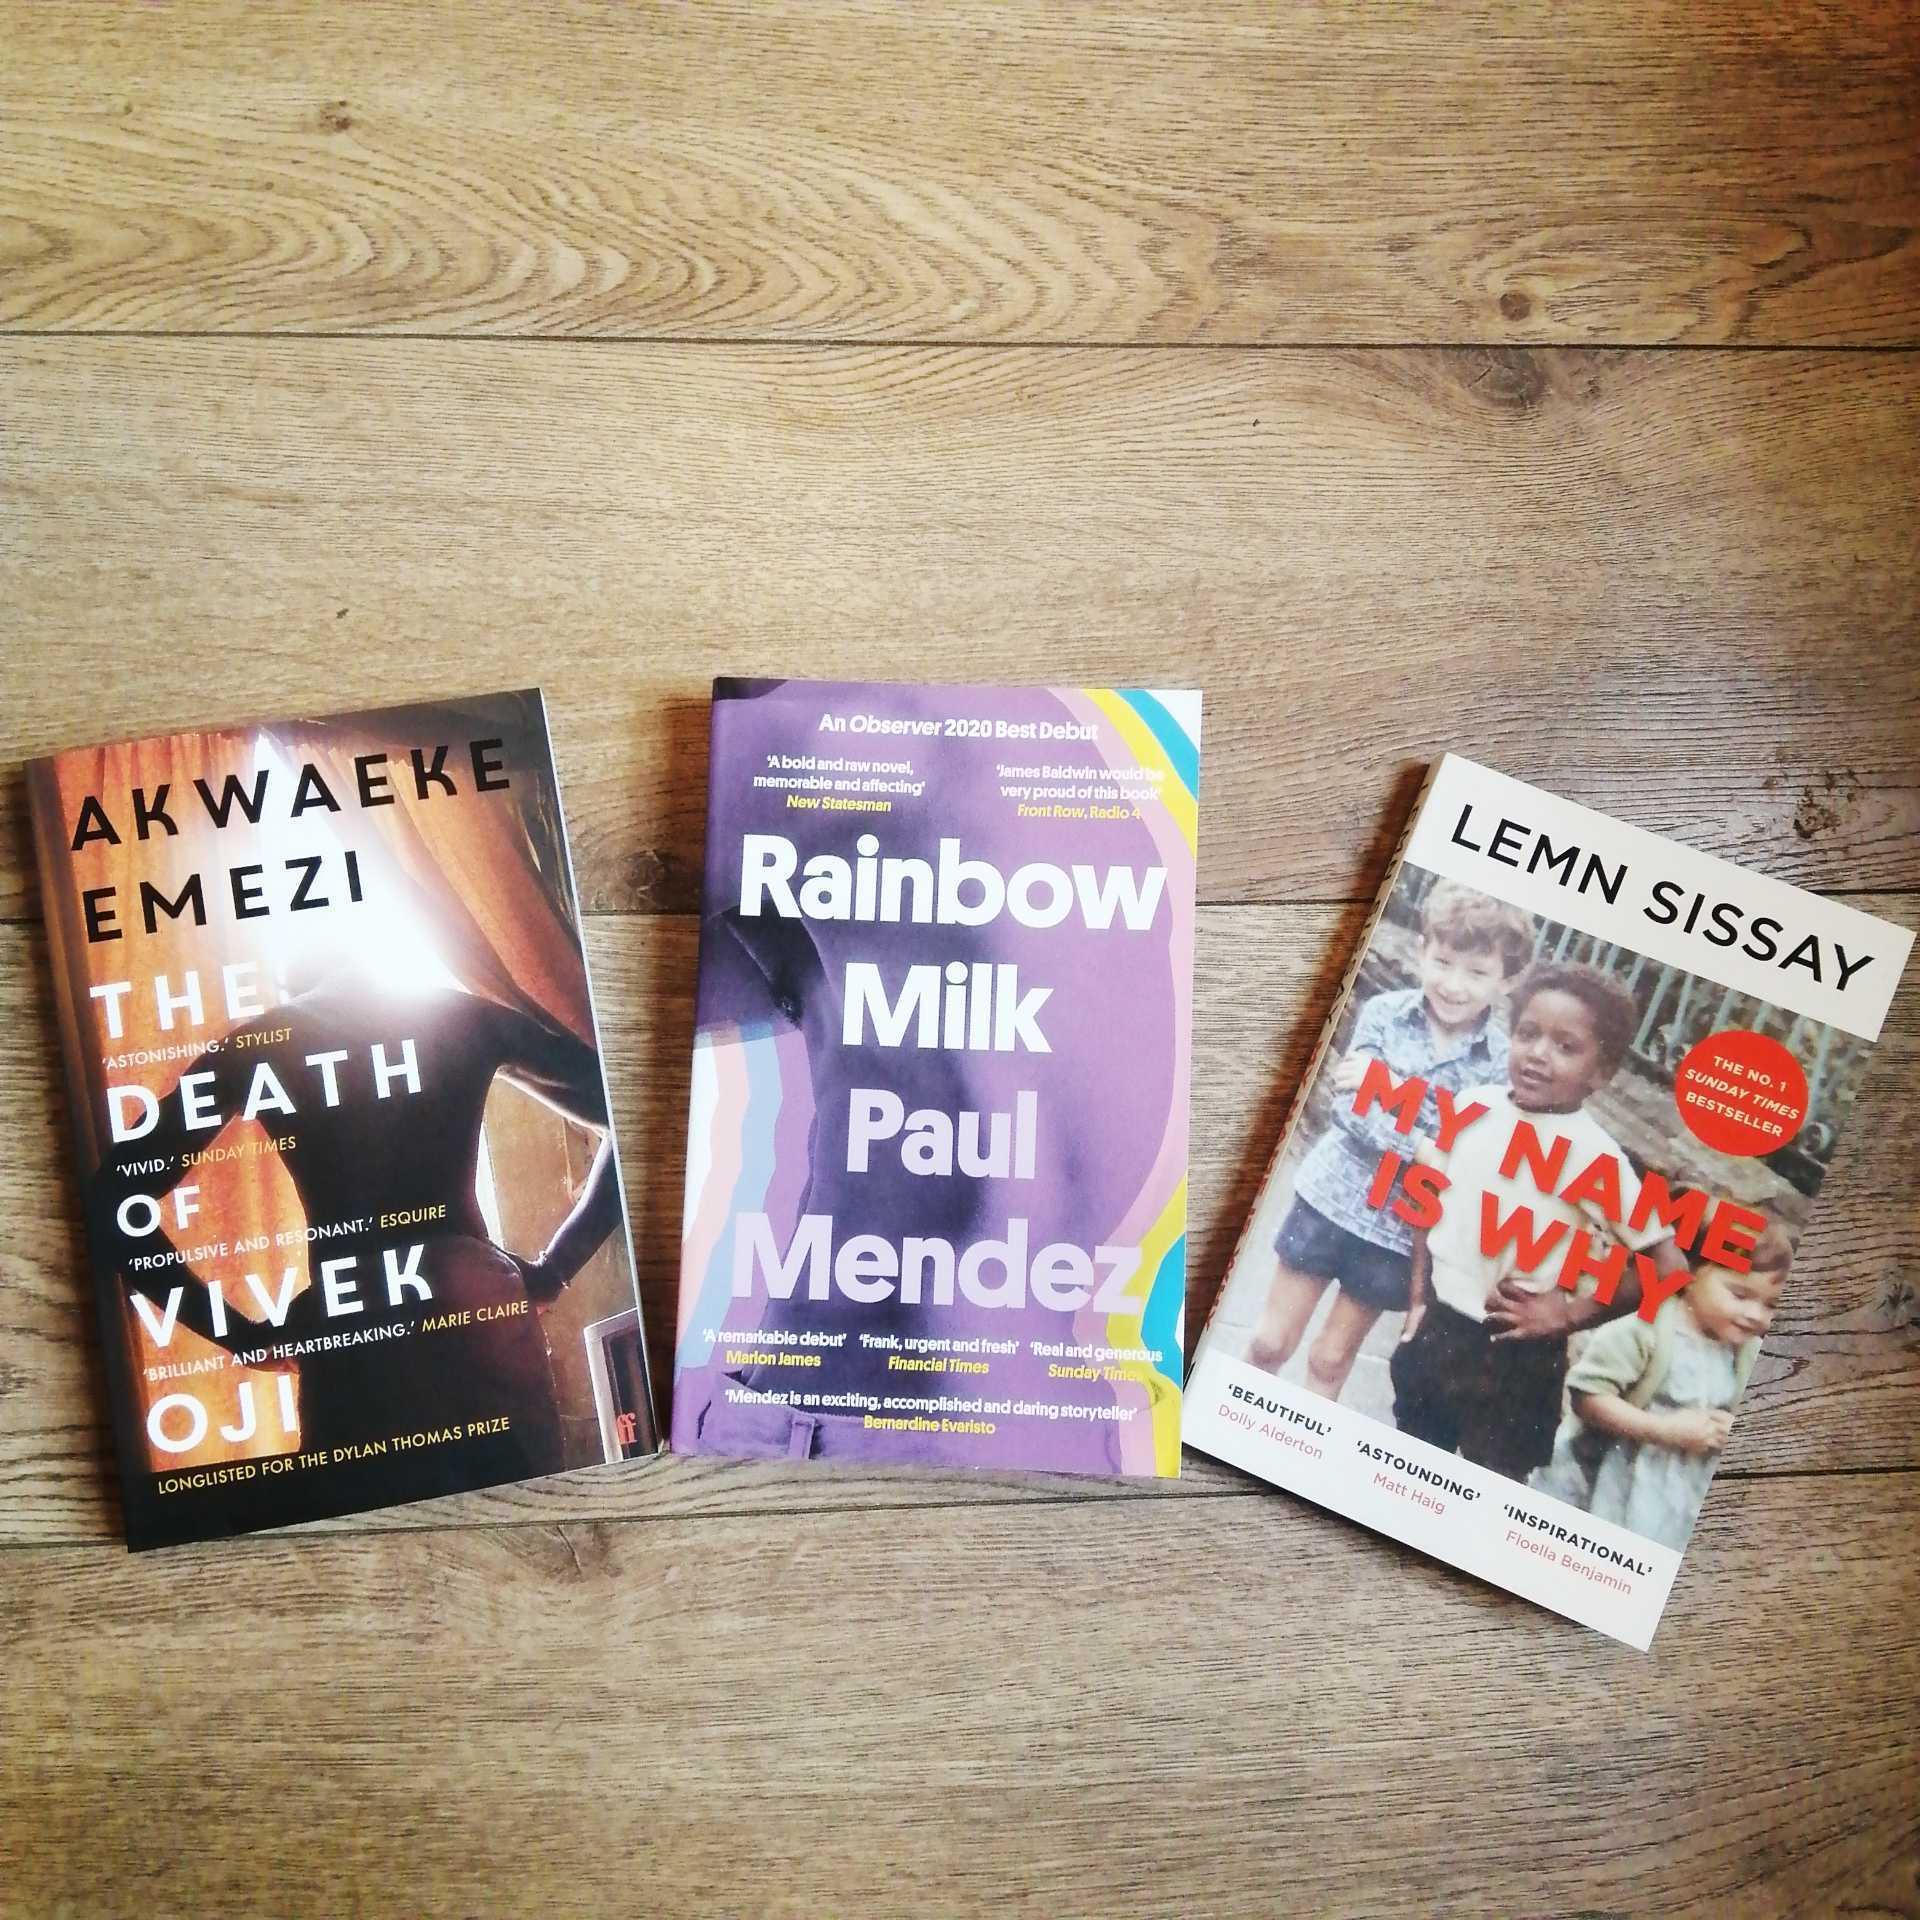 The death of Vivek Oji by Akwaeke Emezi, Rainbow Milk by Paul mendez and My Name is Why by Lemn Sissay